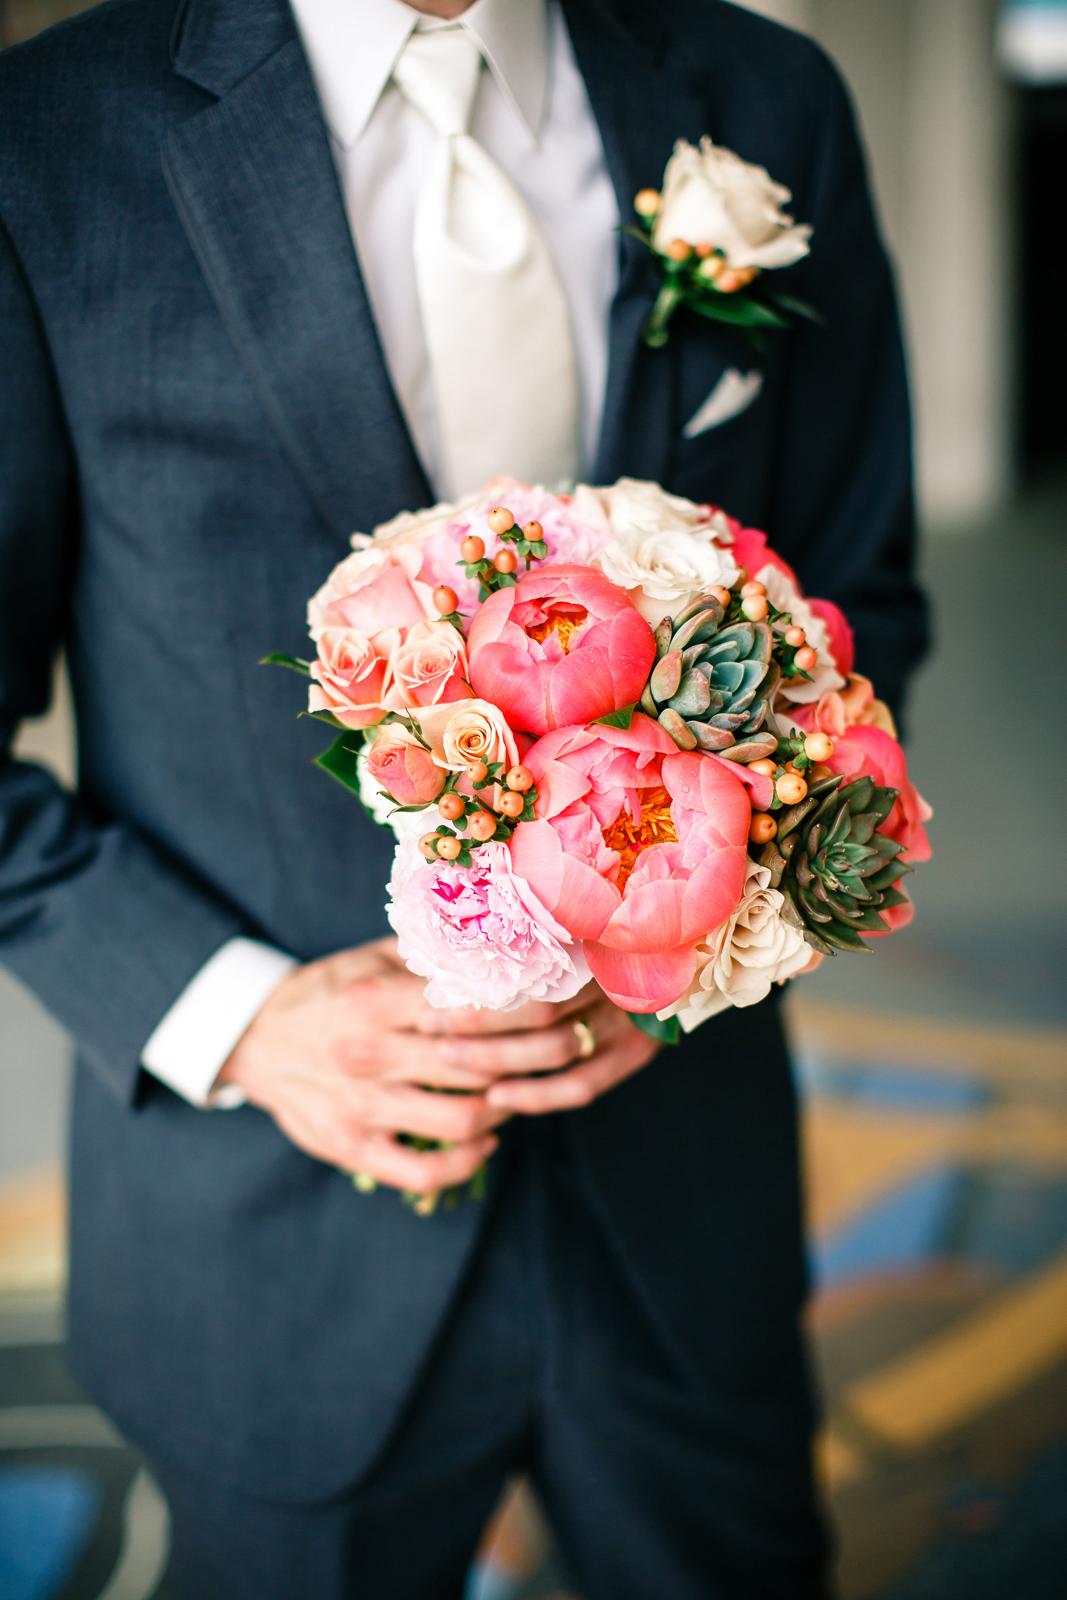 Bride Groom The Muny Schnucks Florist St Louis Wedding Photographer Oldani Photography 5.jpg